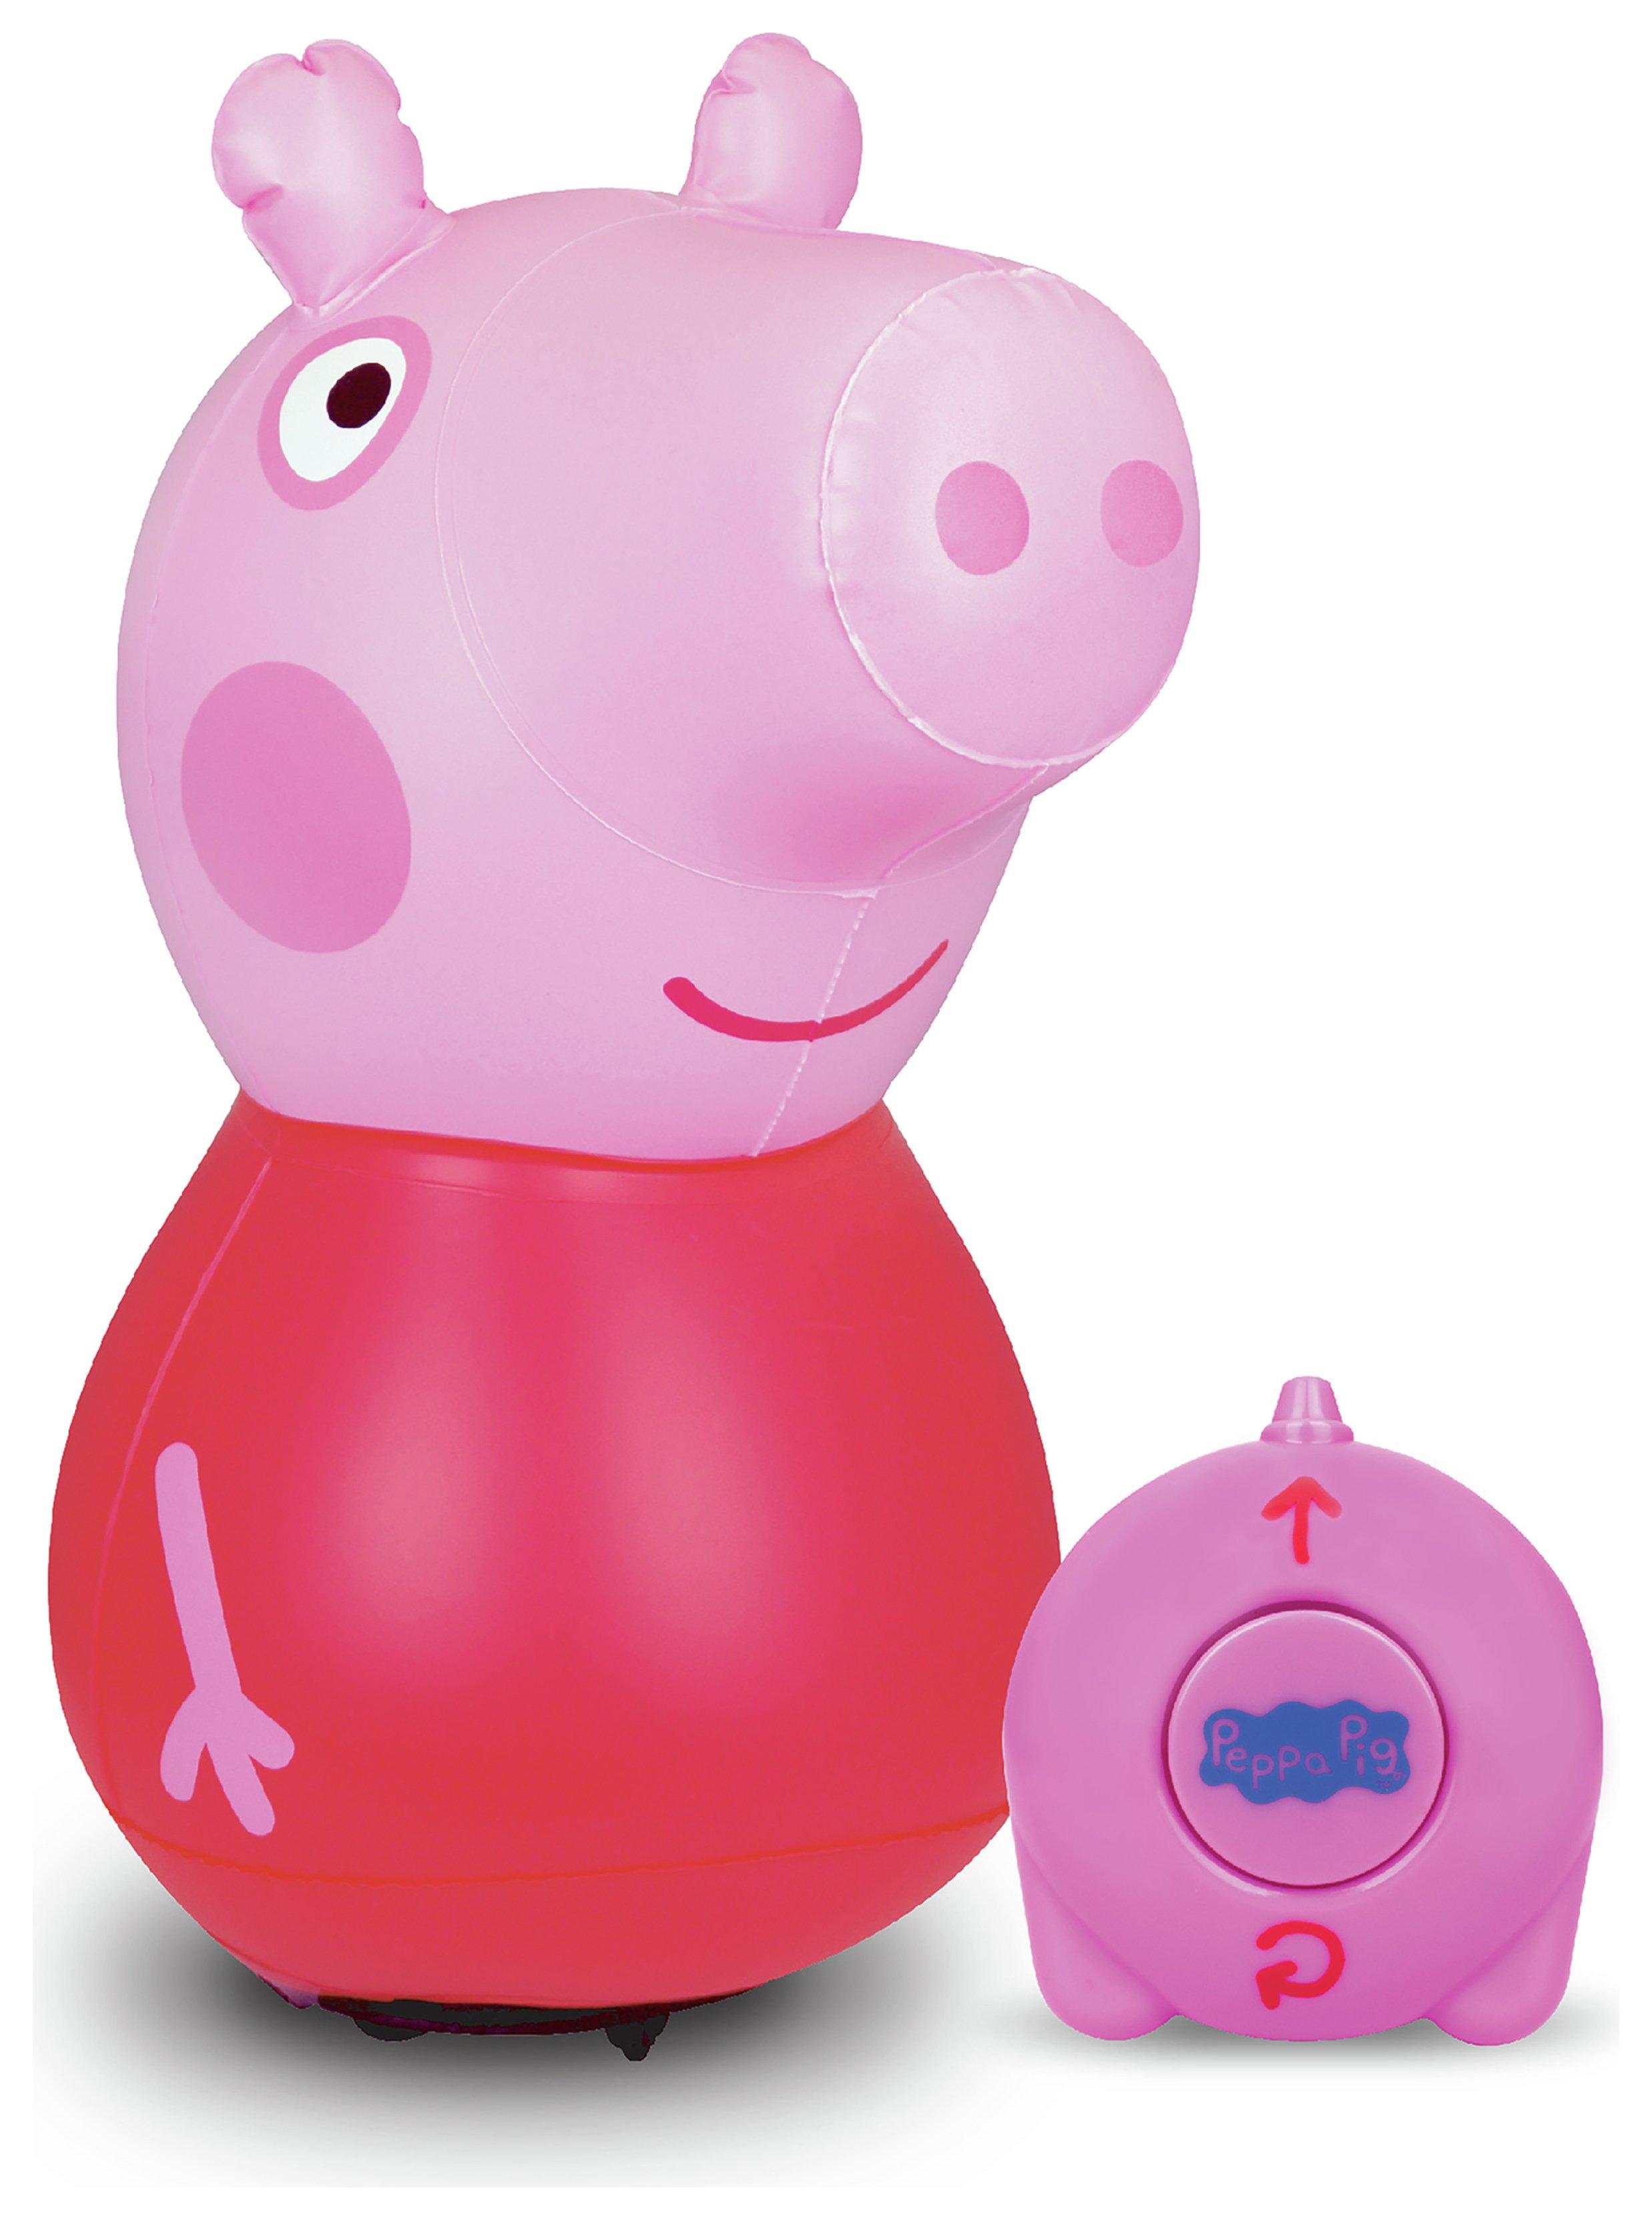 Peppa Pig RC Inflatable Peppa Pig.